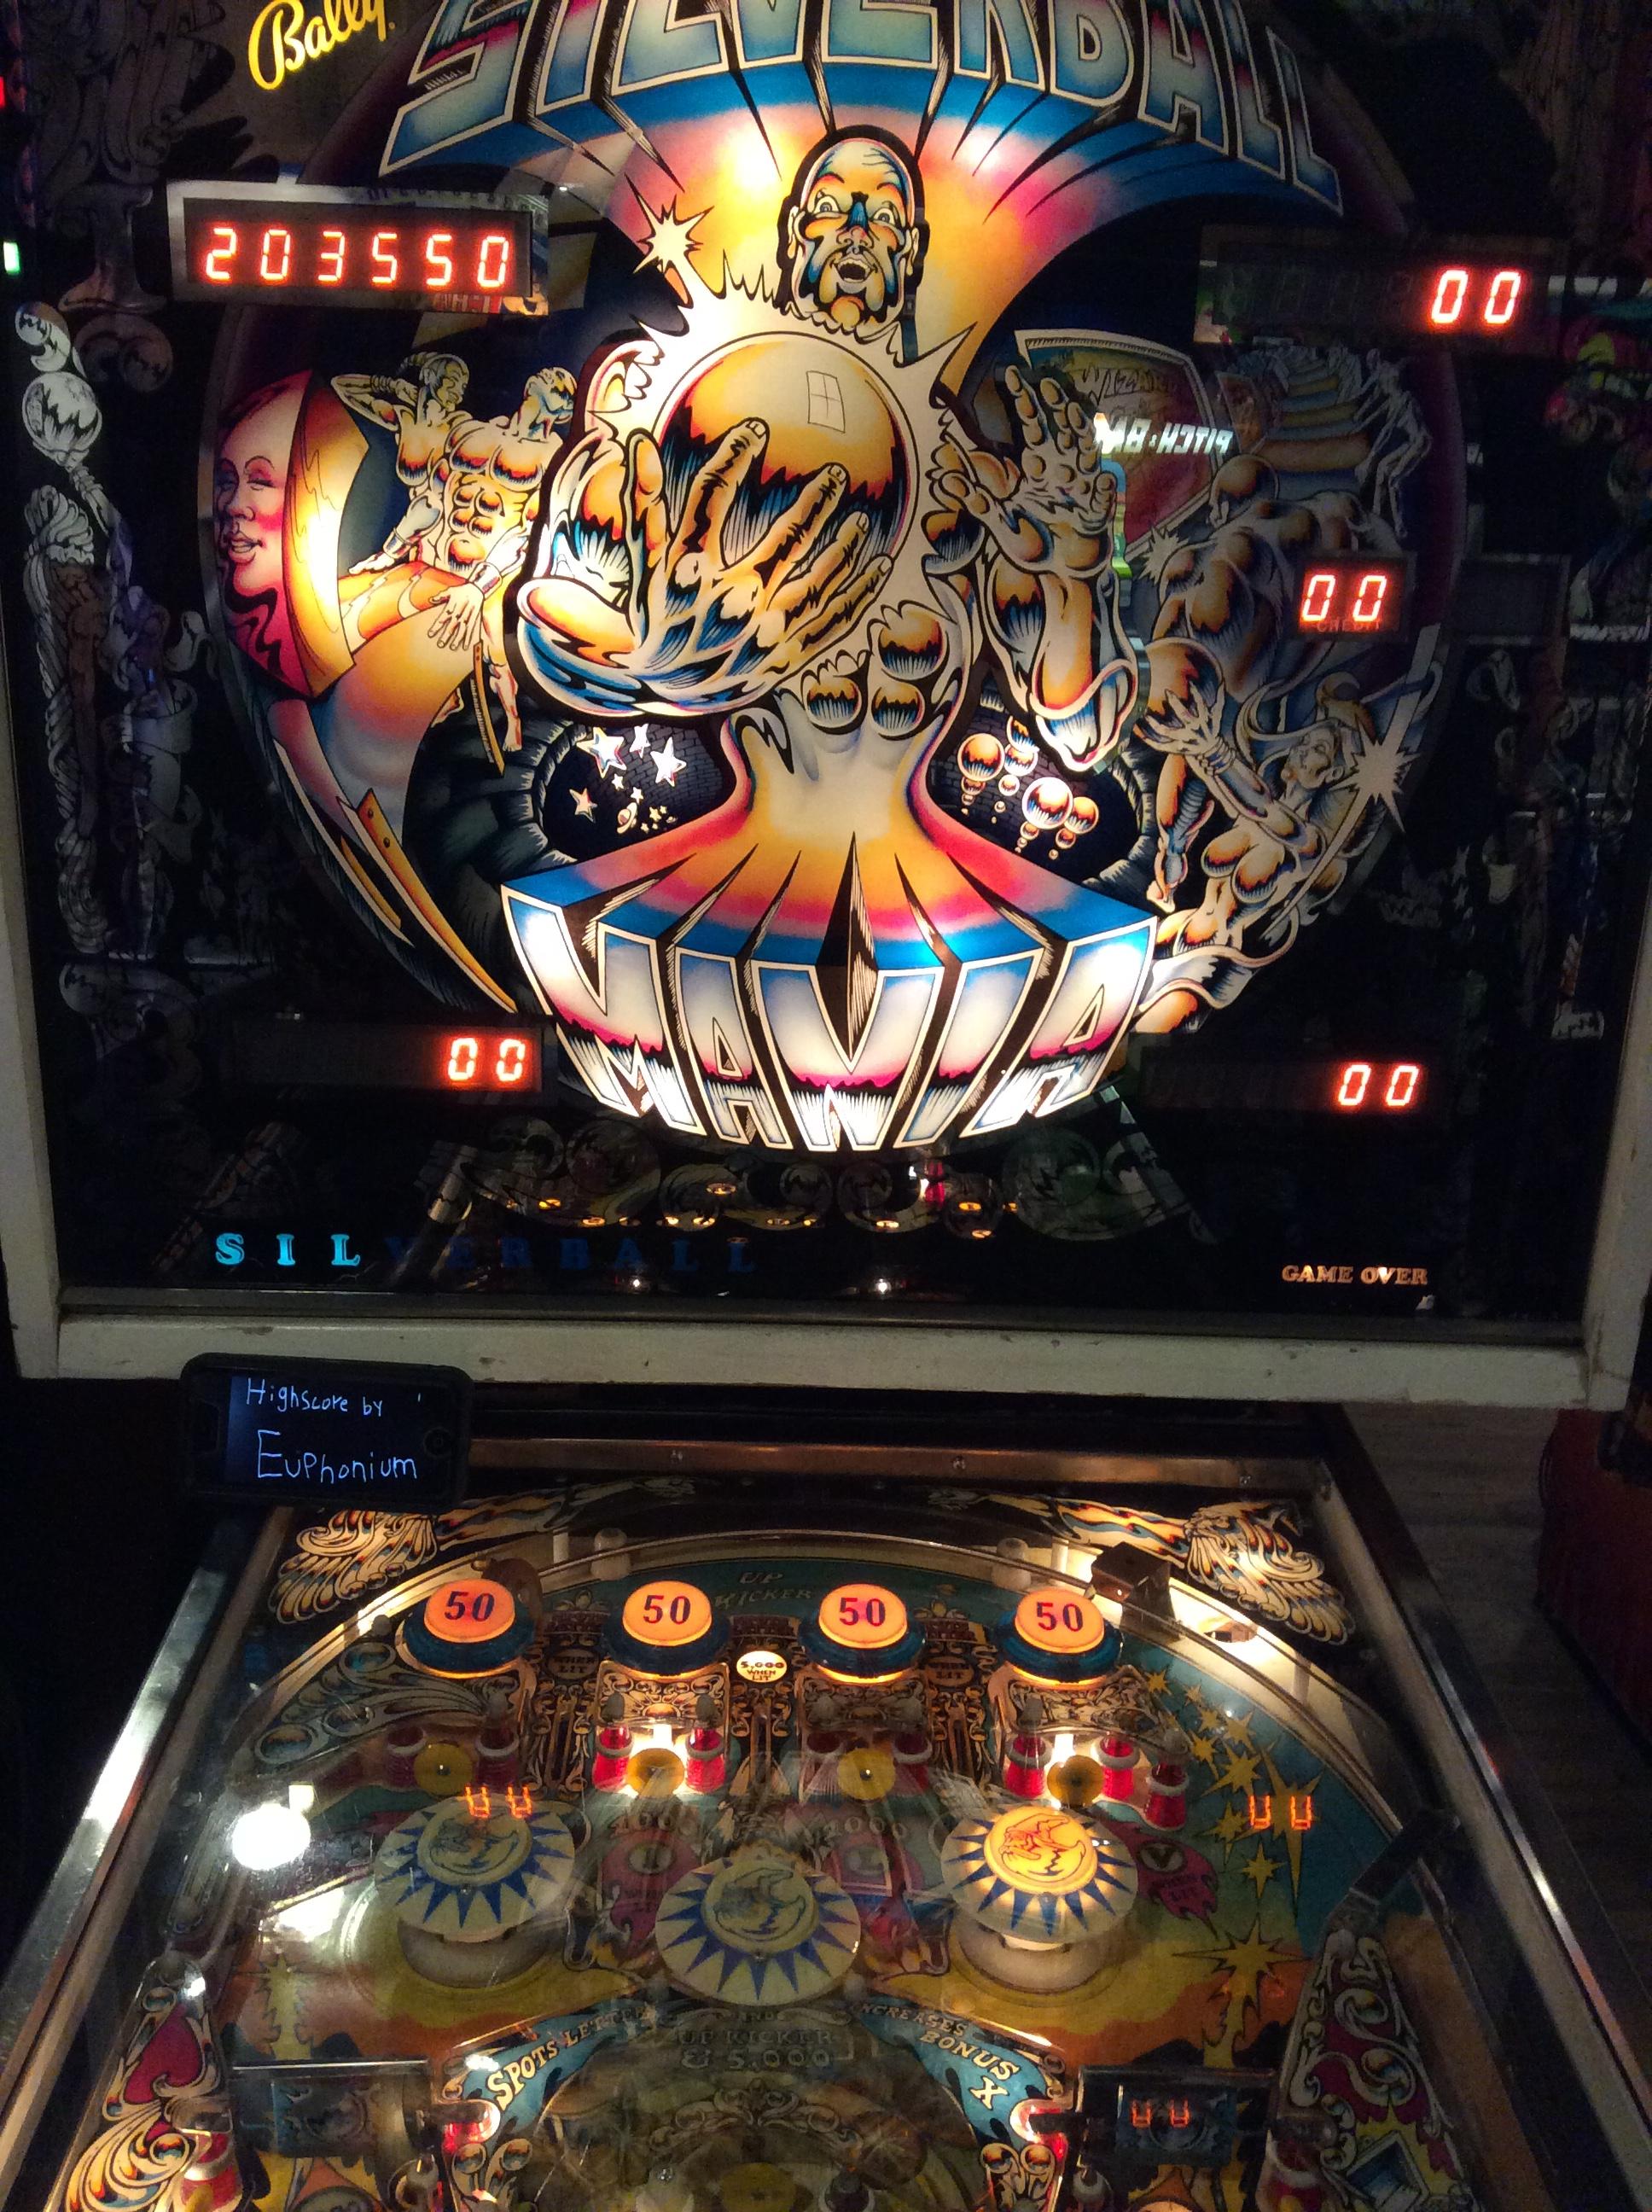 euphonium: Silverball Mania (Pinball: 3 Balls) 203,550 points on 2016-08-31 08:08:28